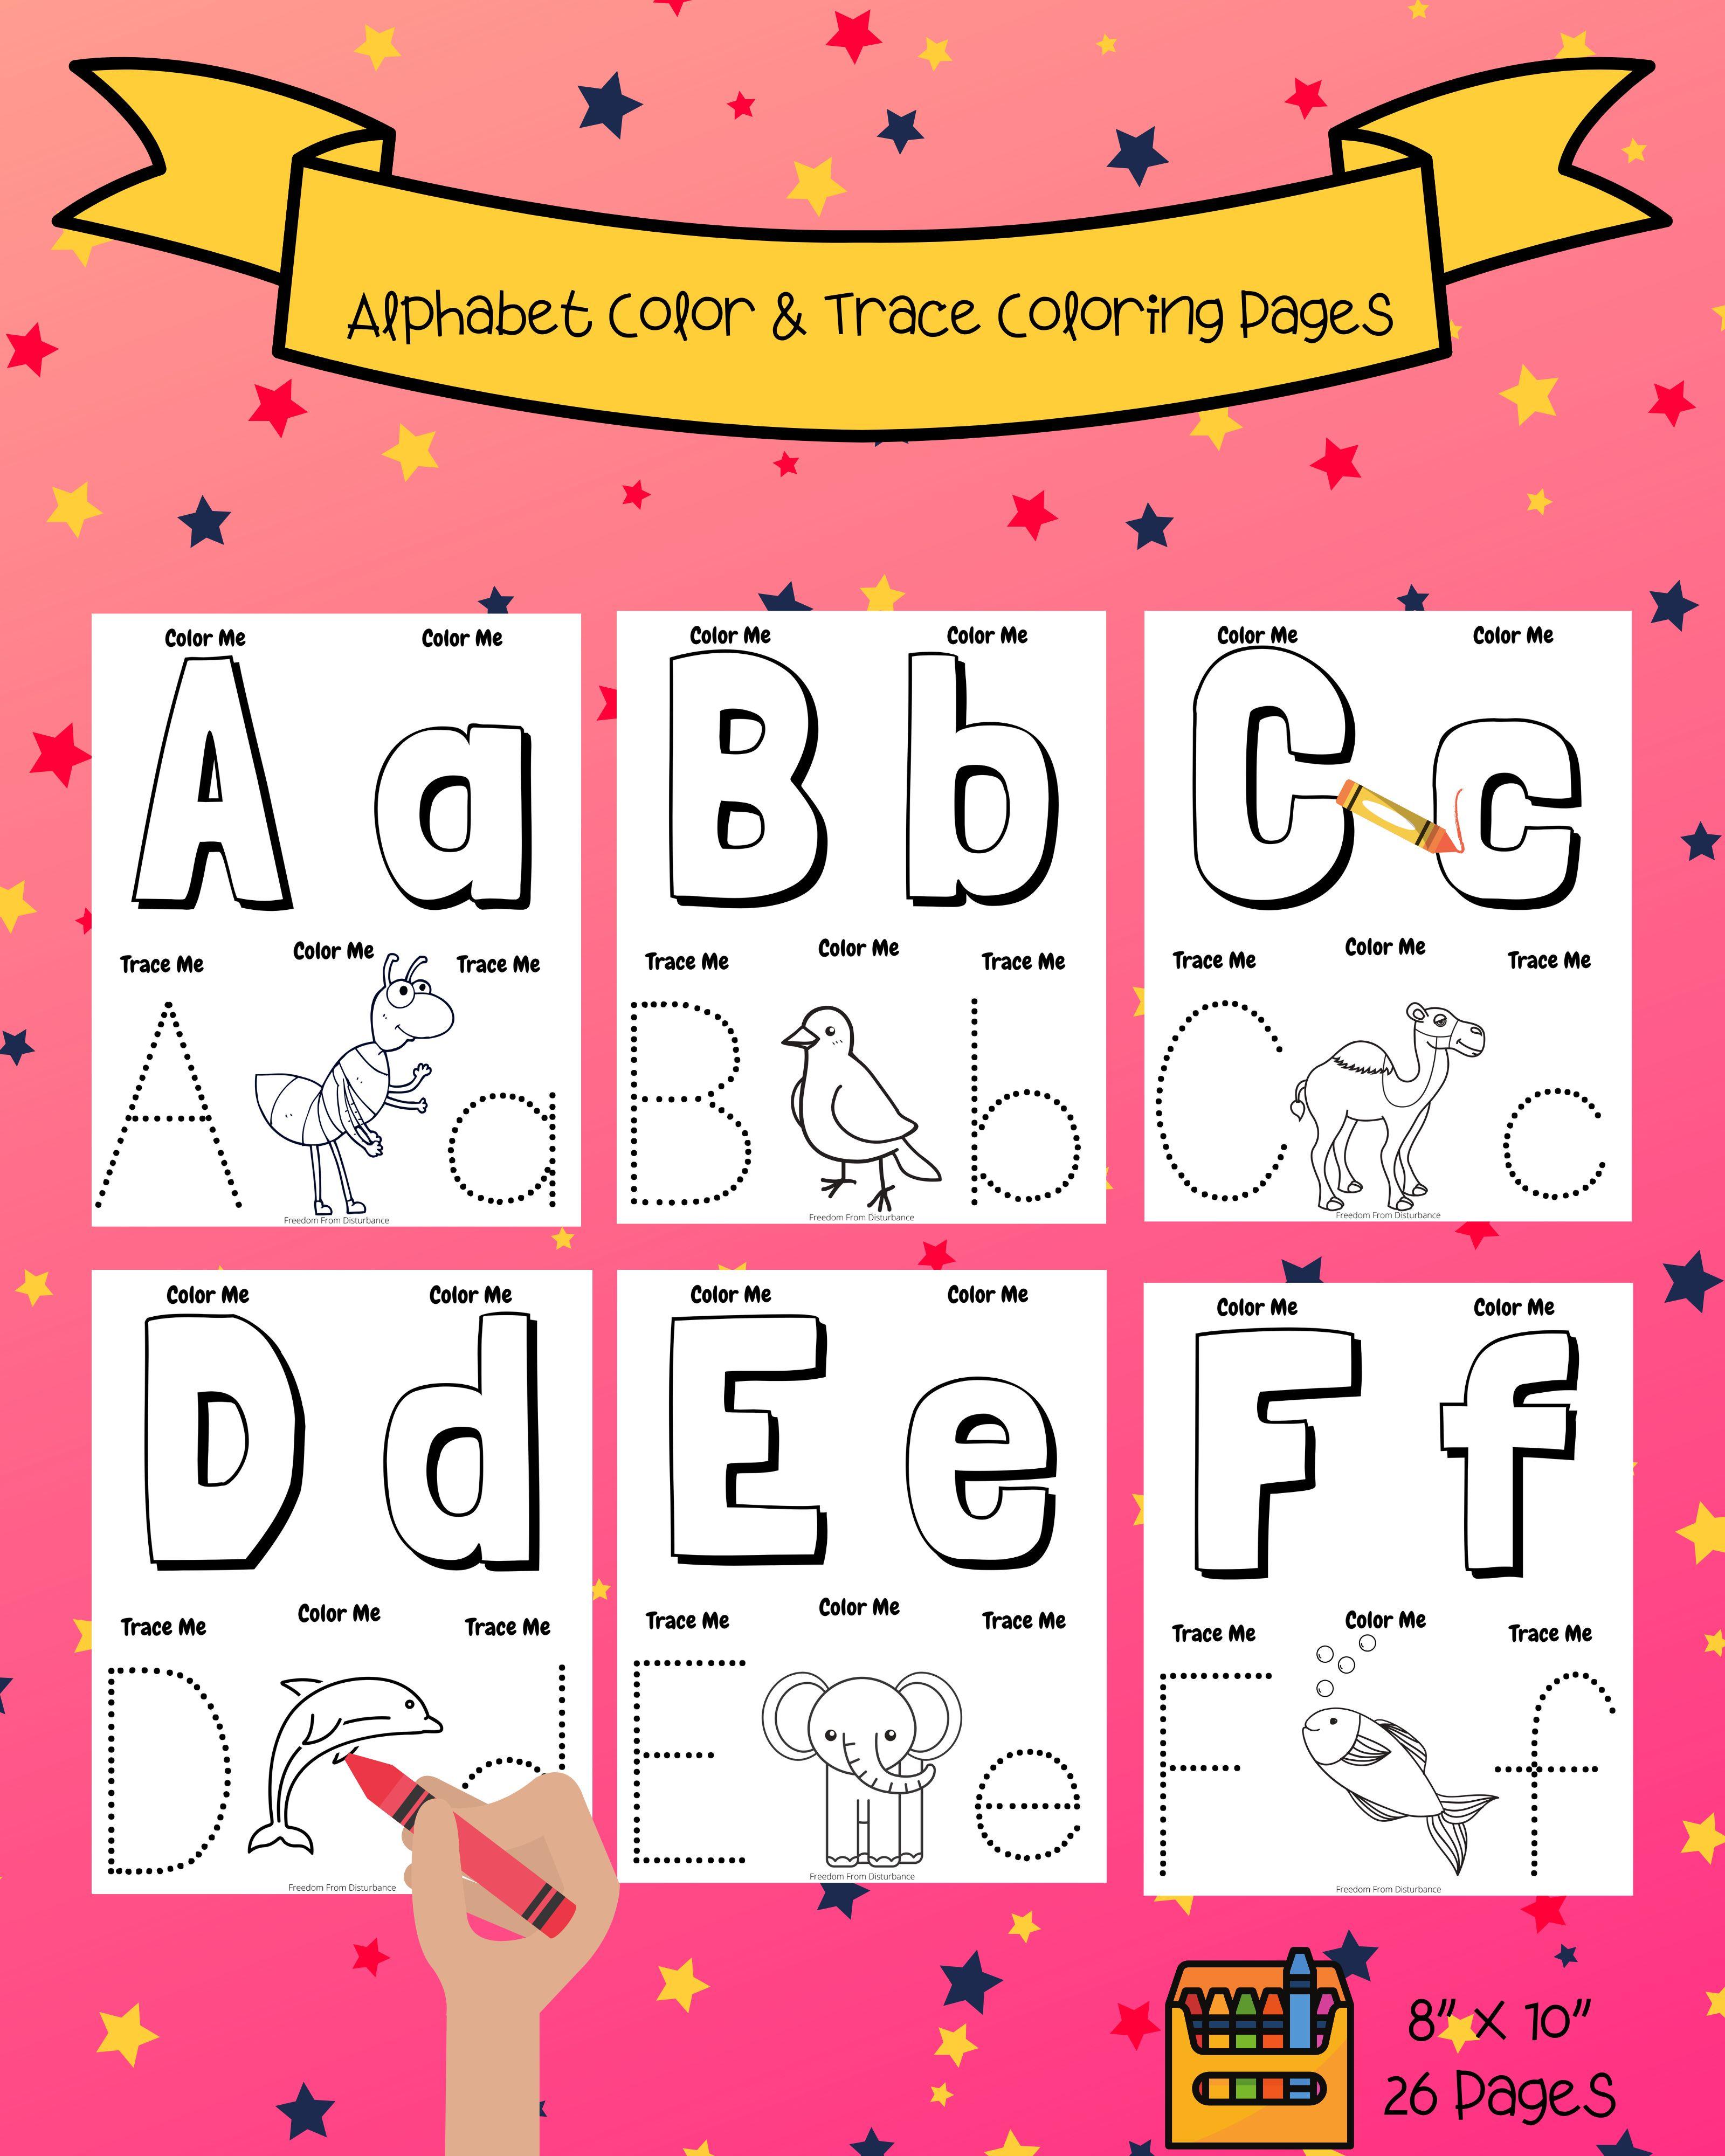 Abc Book Alphabet Book Coloring Pages Abc Coloring Book Instant Download Pdf Alphabet Book Abc Coloring Abc Book